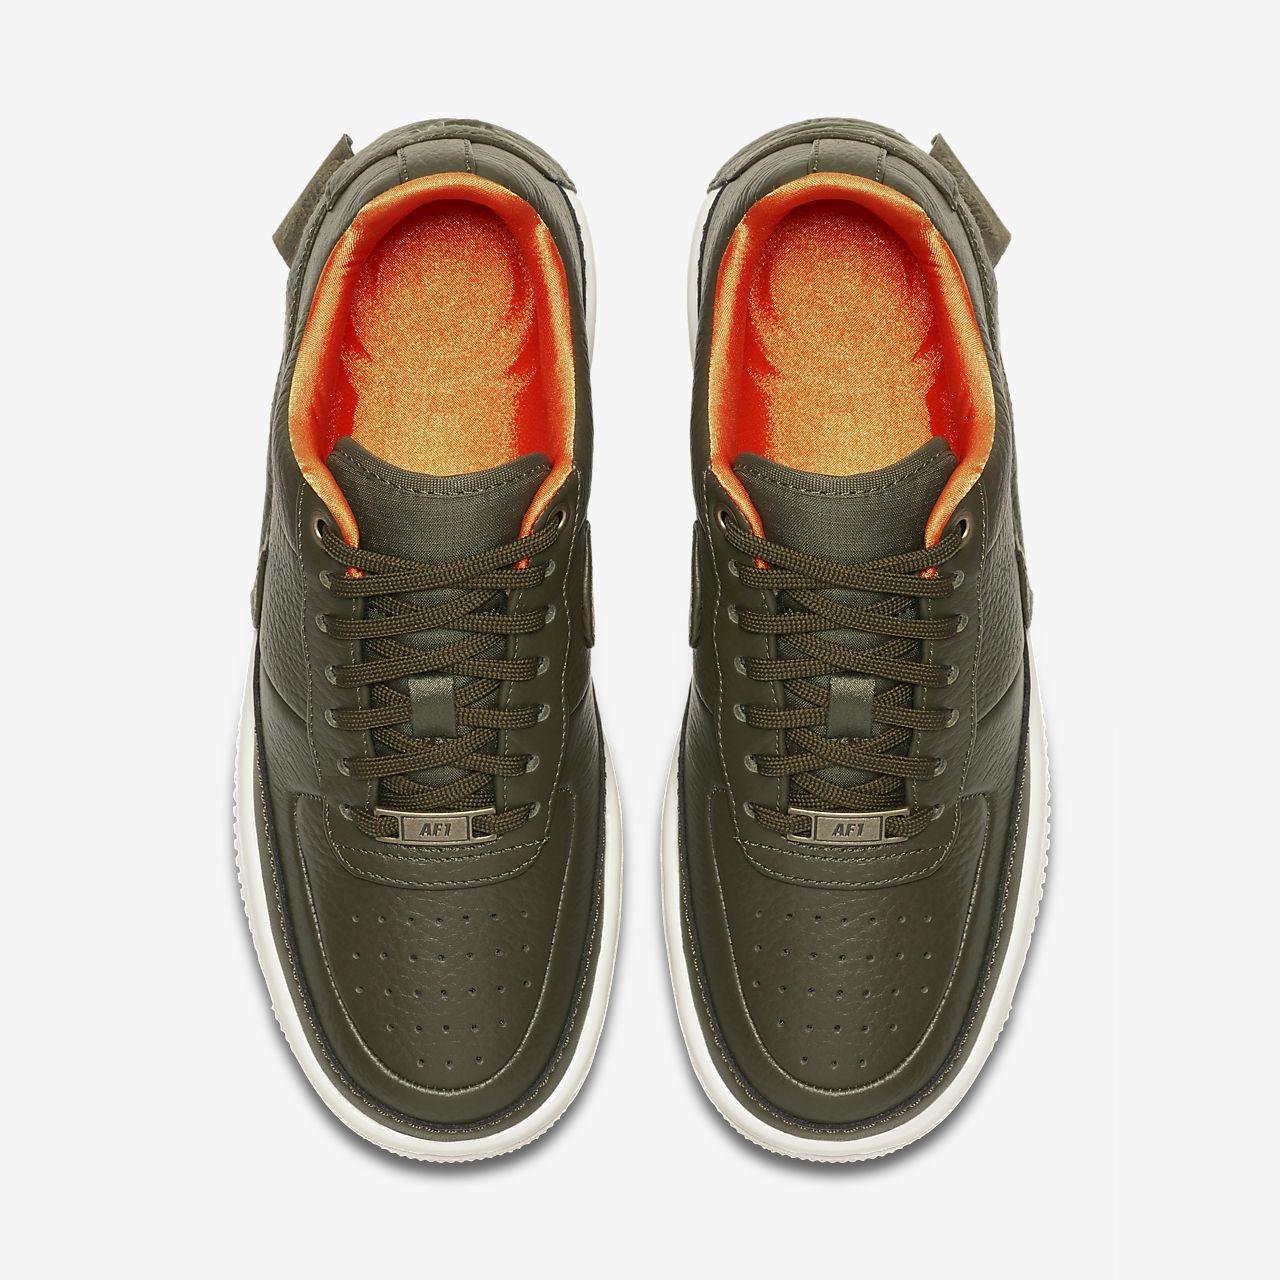 best website cb655 7b29d ... Sko för kvinnor Nike Air Force 1 Jester XX Premium